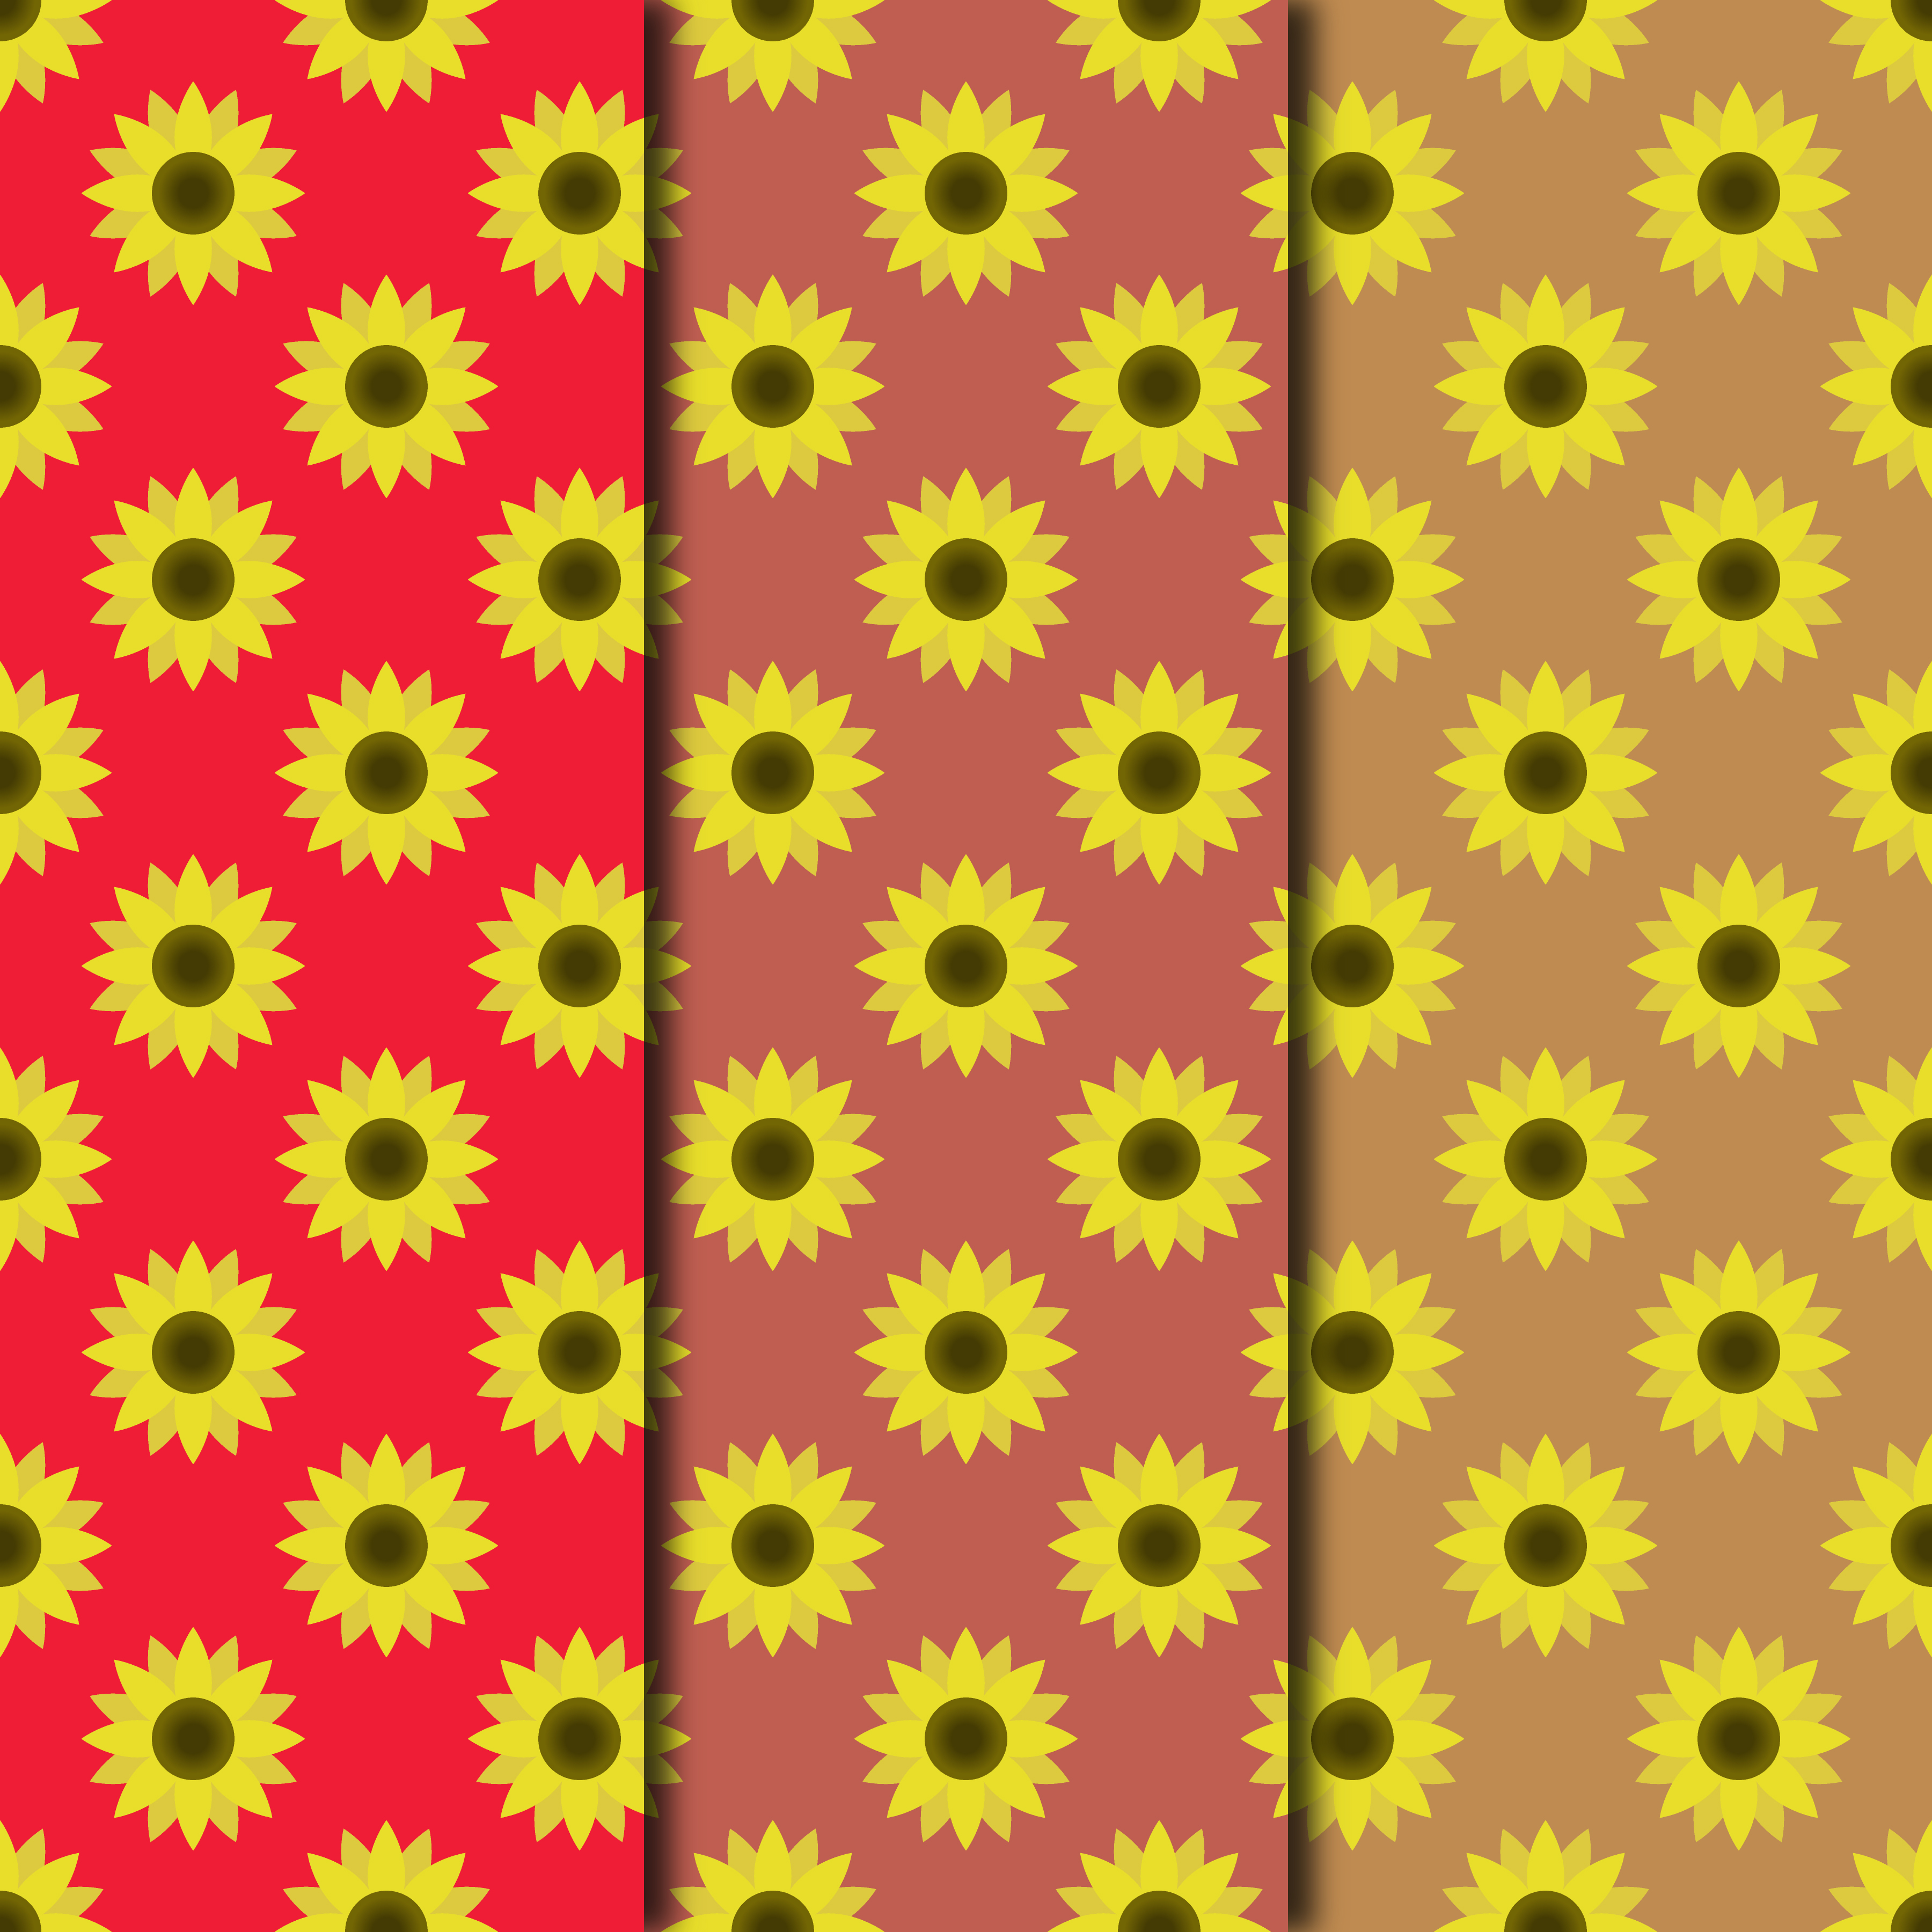 Blooming Sunflowers Digital Paper example image 5